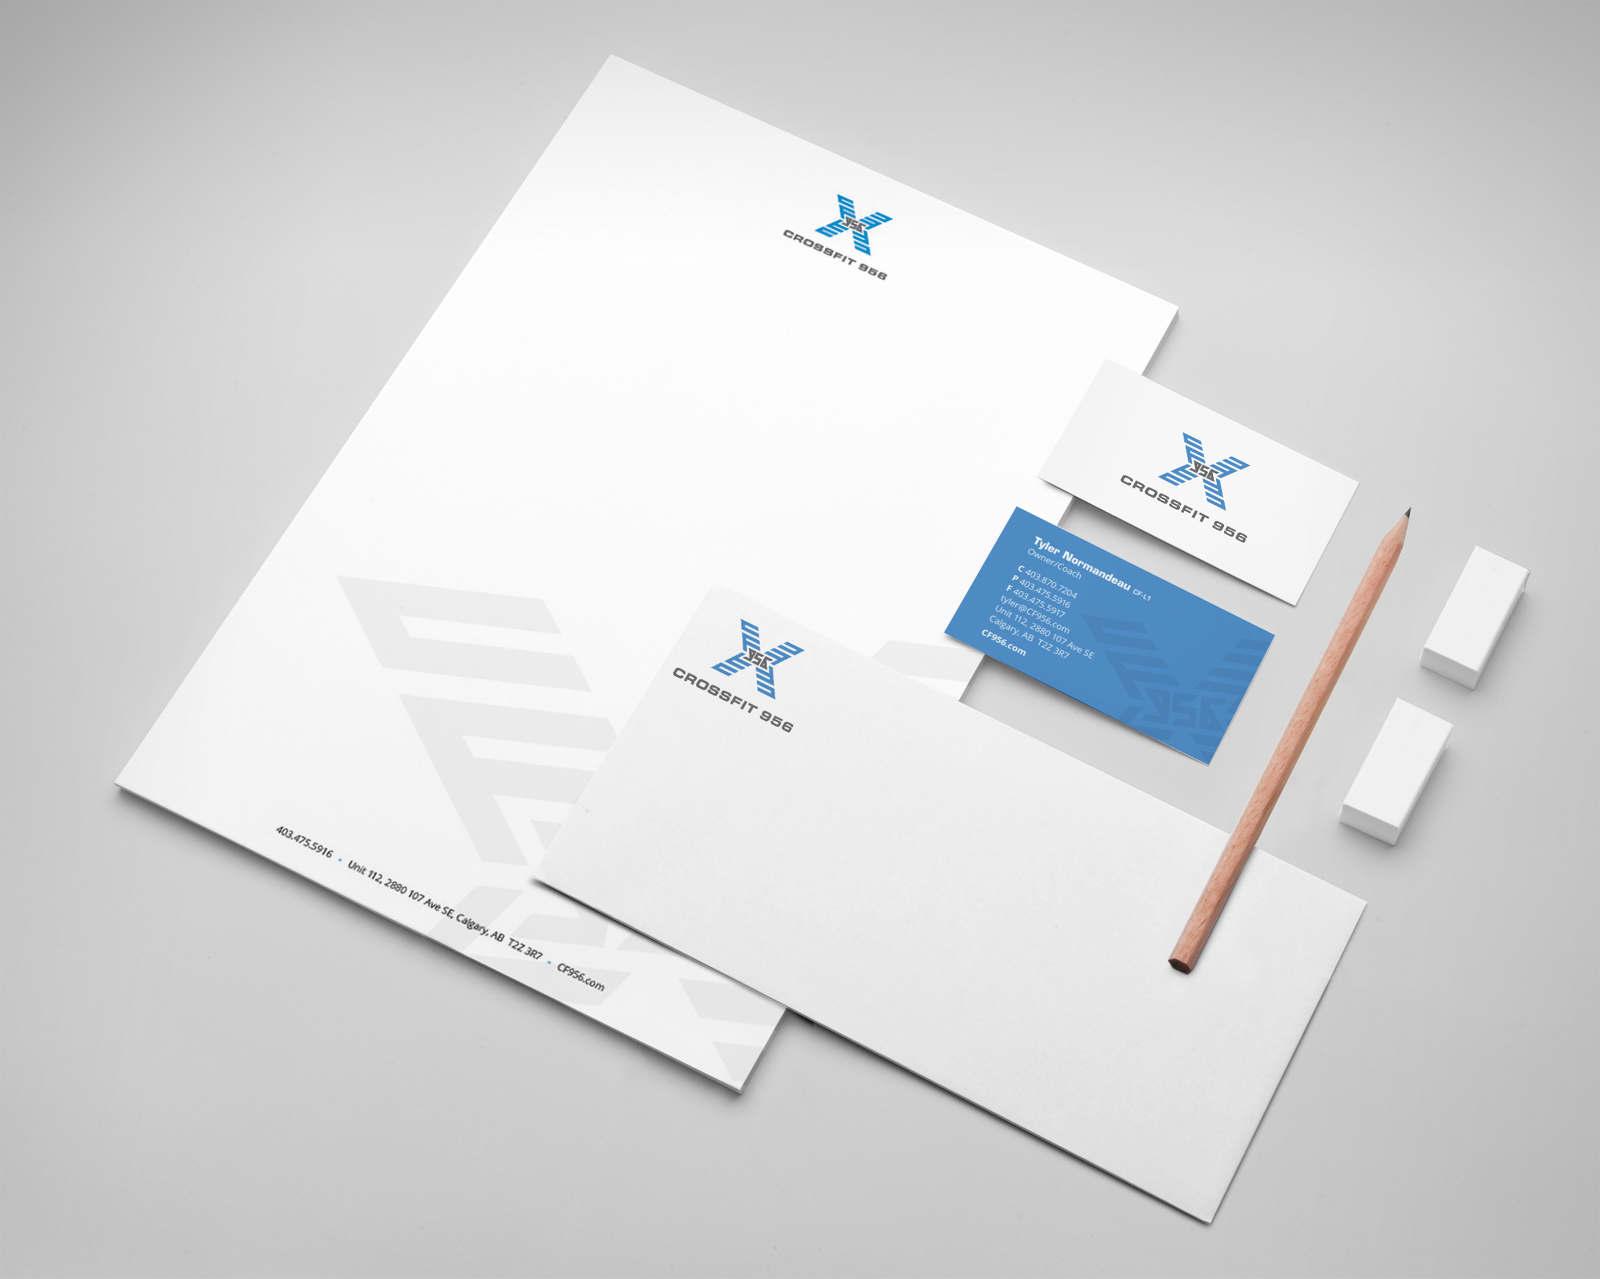 Stationery-Mockup-Template---Demo-copy_1600_c.jpg